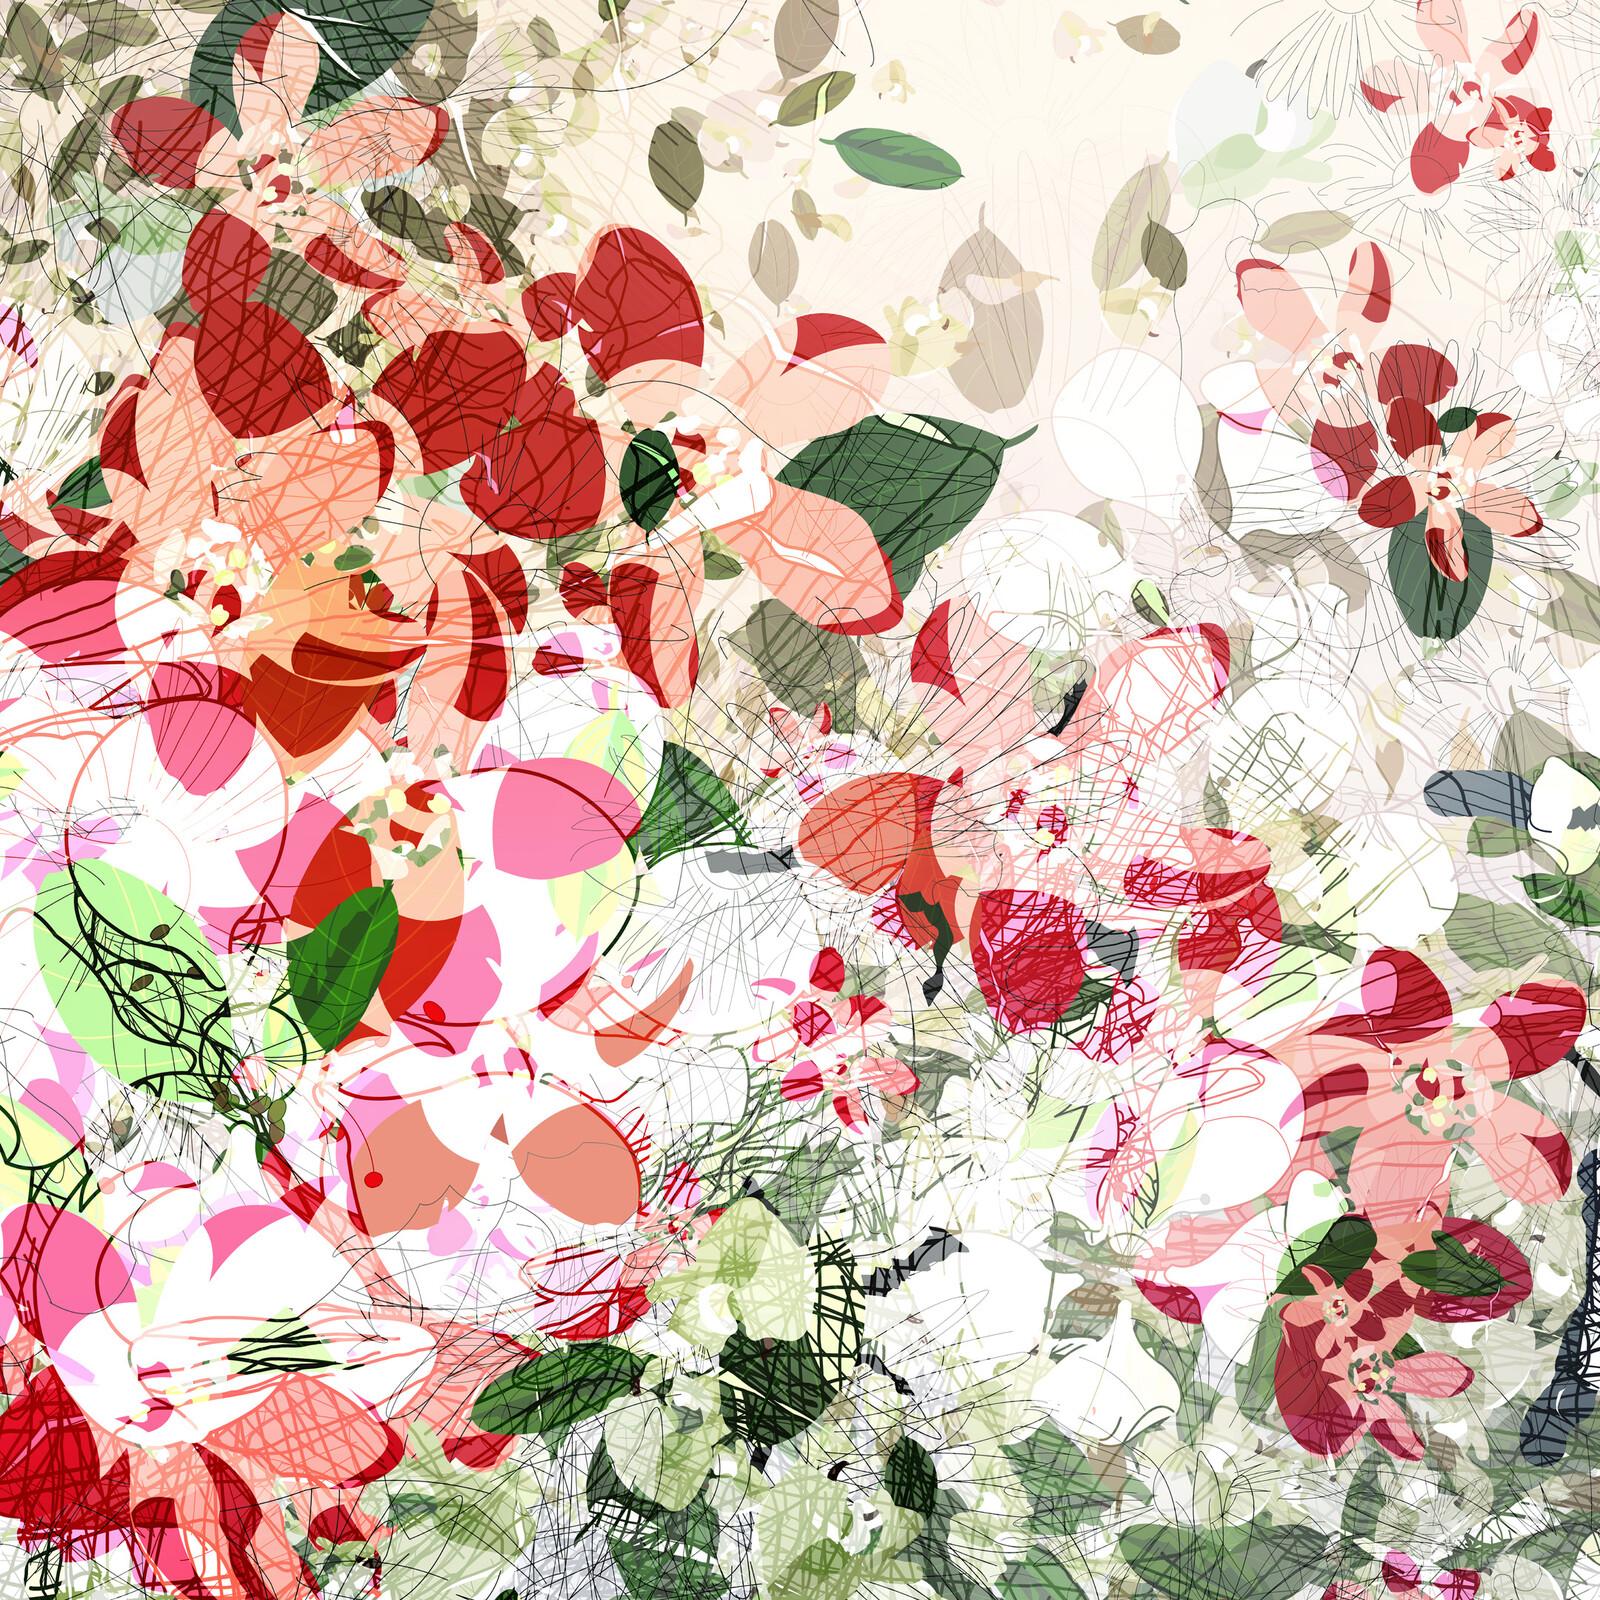 Peach Blossom - Christine Jaschek